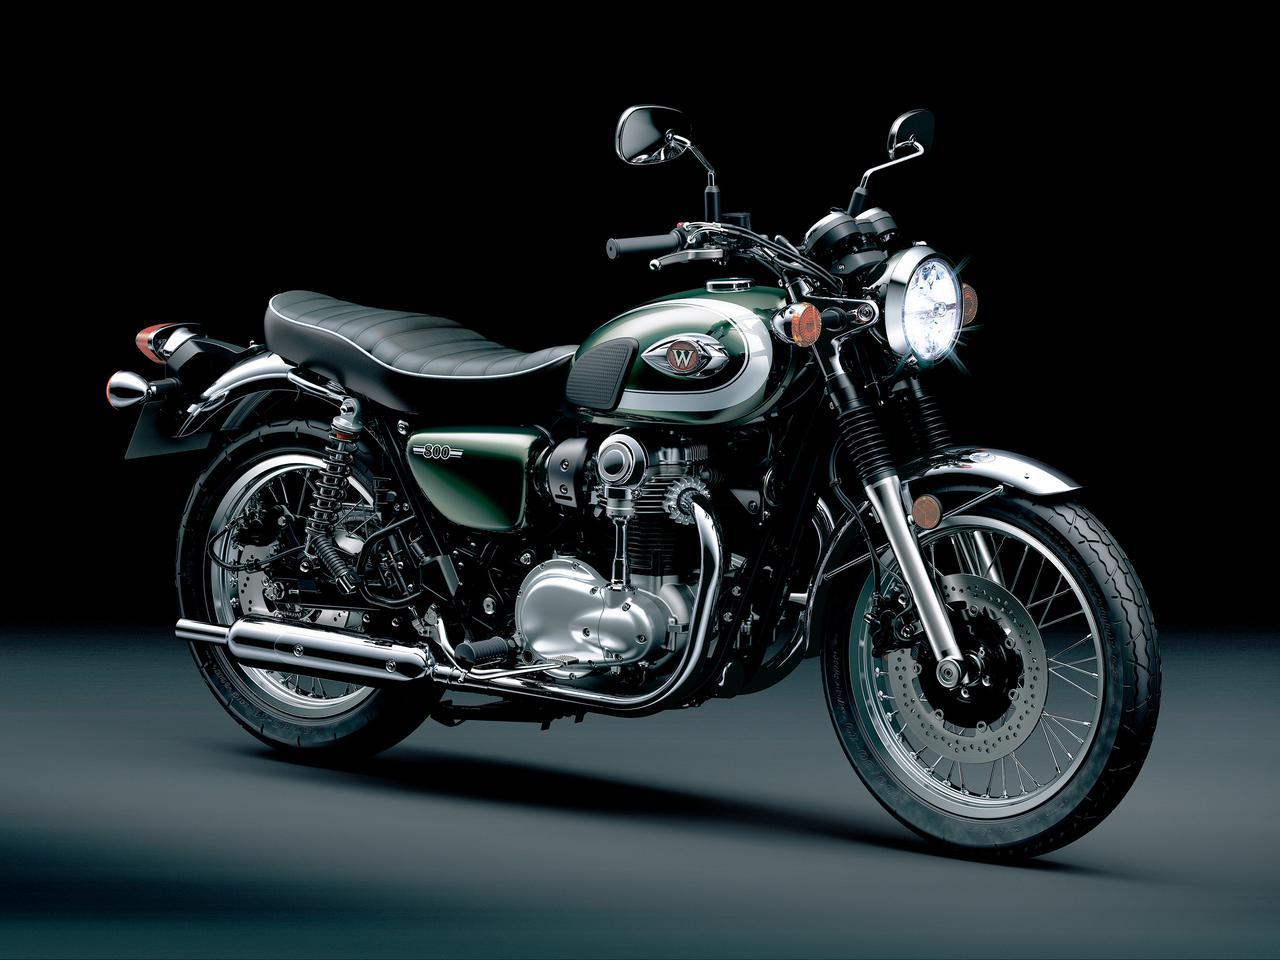 Images : 1番目の画像 - KAWASAKI W800の写真をまとめて見る! - webオートバイ